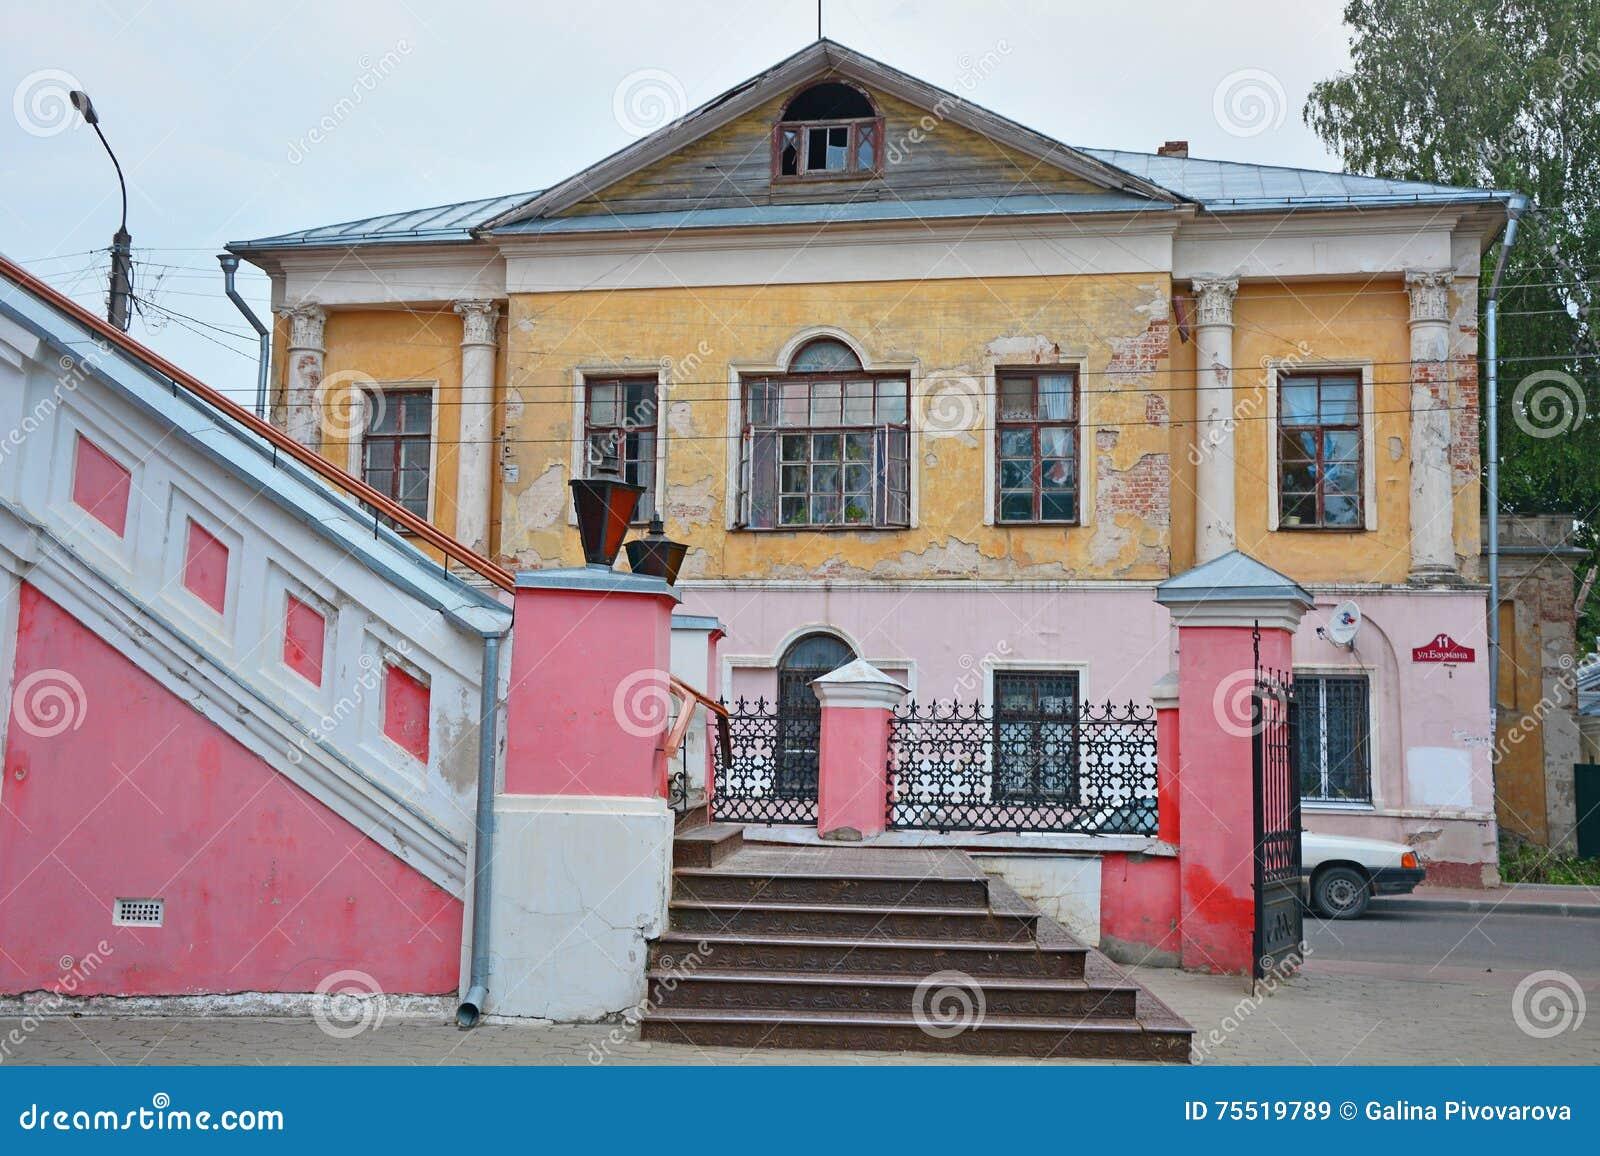 Half-ruined chambers of the tradeswoman Faleeva in Kaluga city, Russia